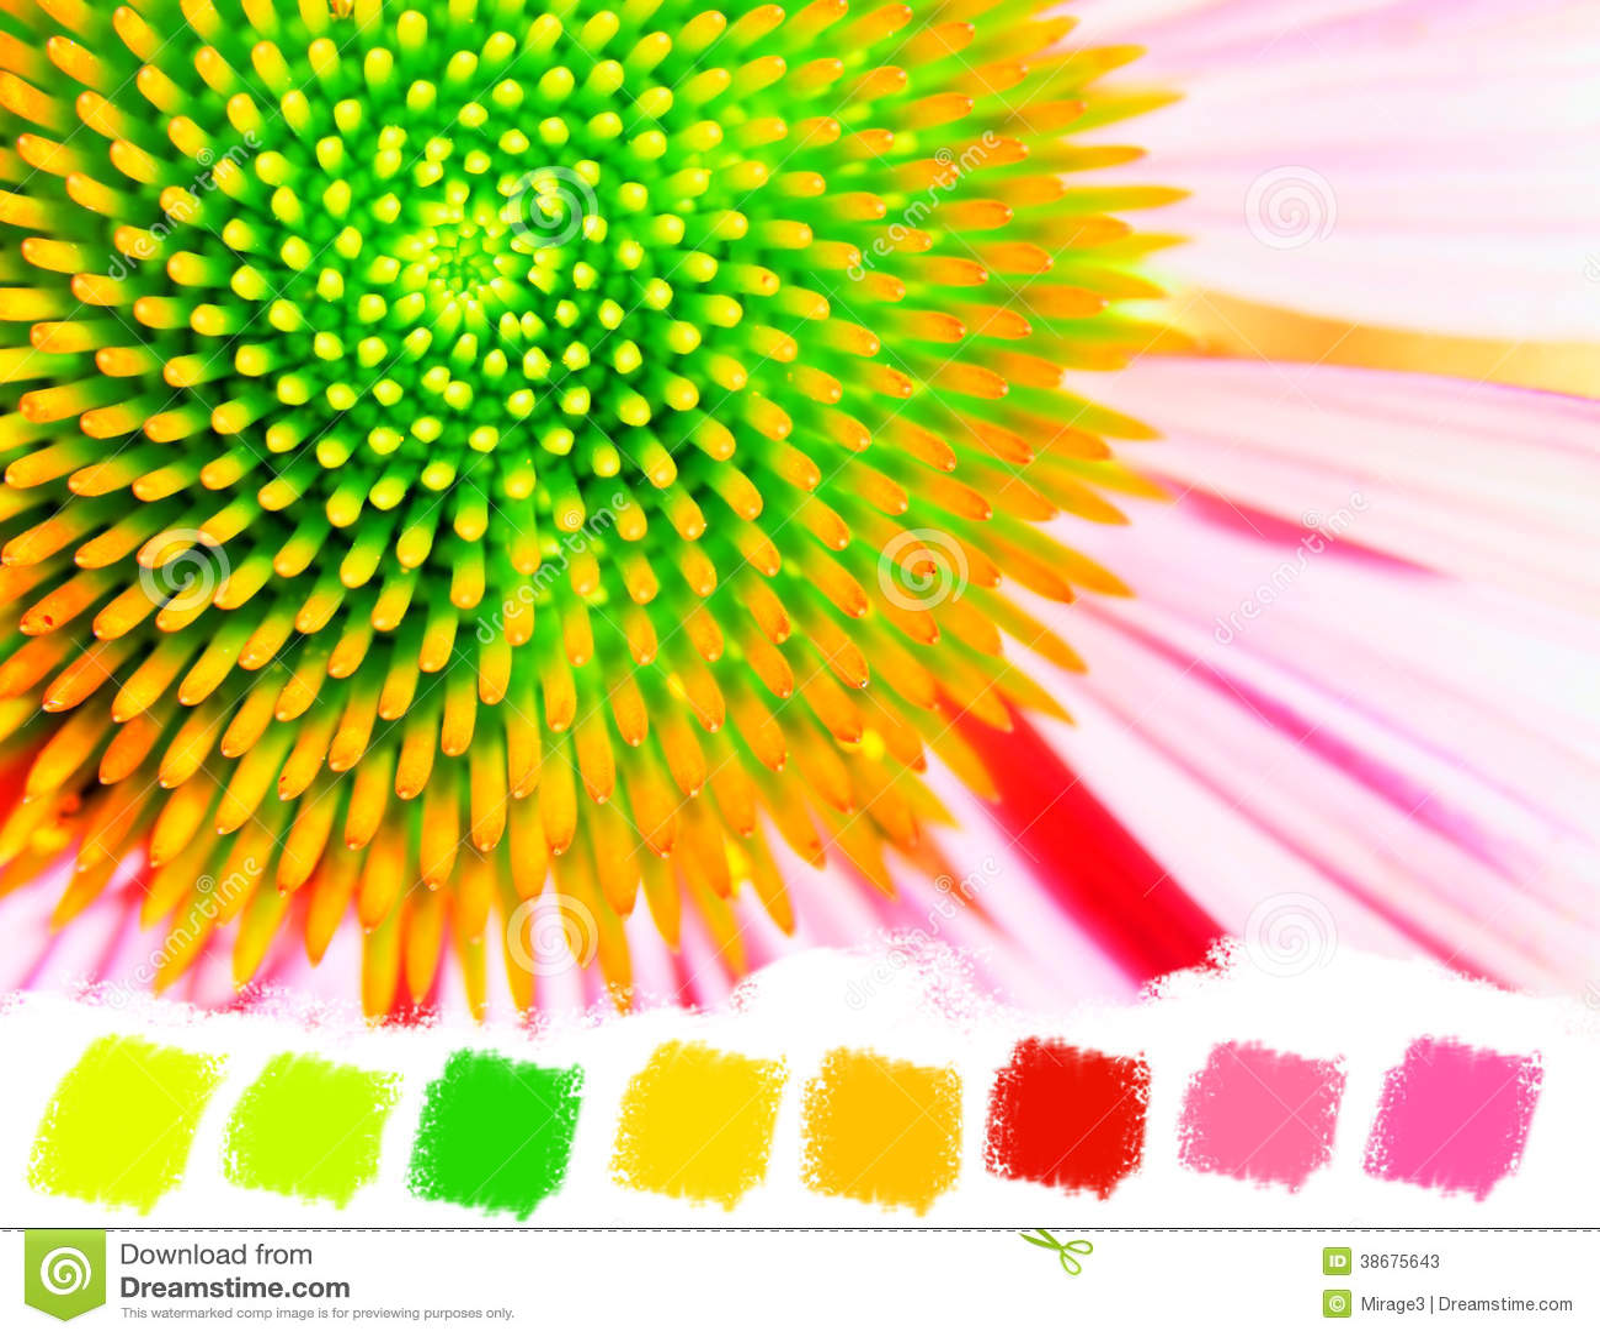 echinacea de nen o paleta de colores prpura del coneflower fotos de archivo